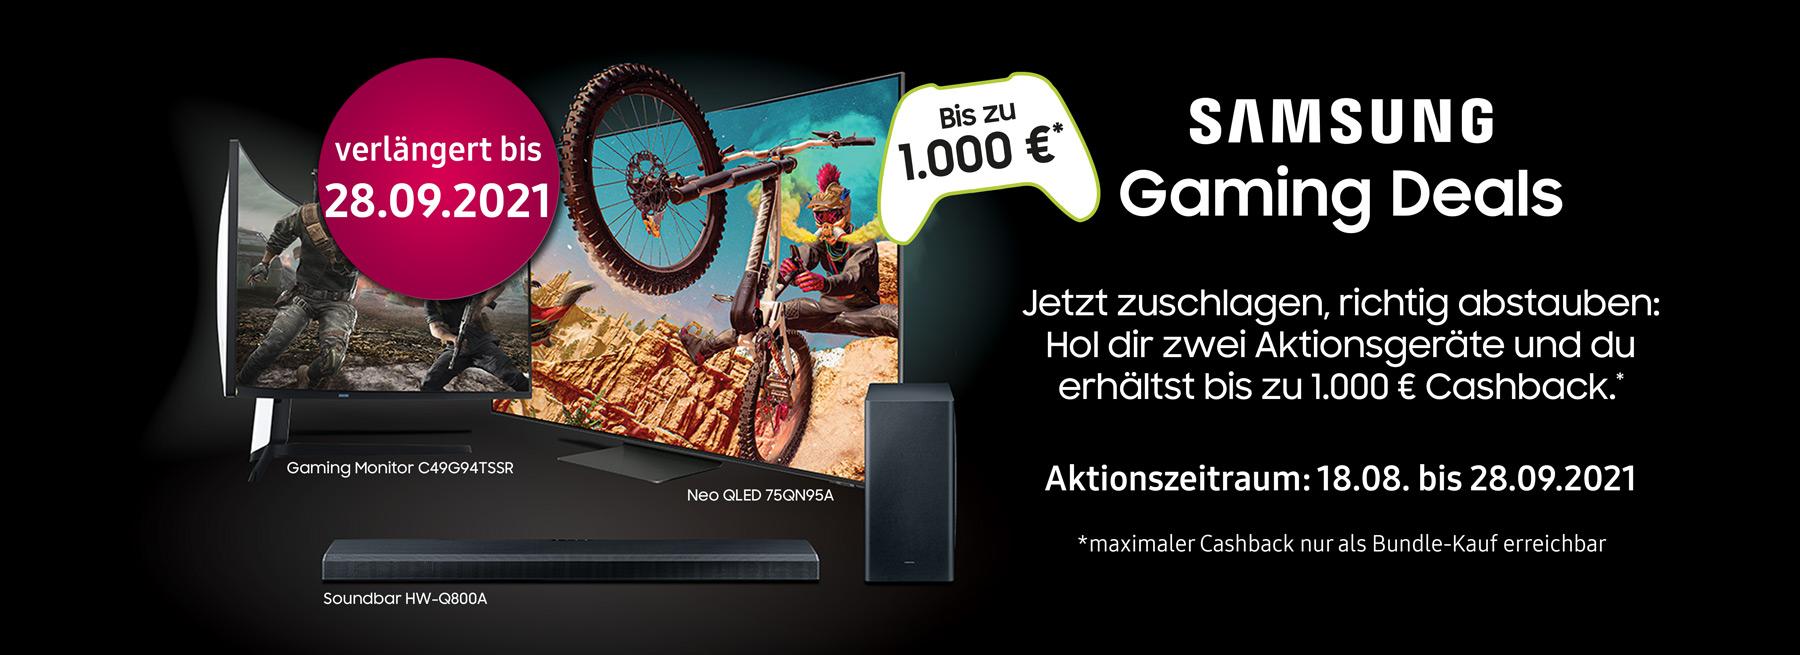 samsung-gaming-deals-august-2021-promotion-verlaengert